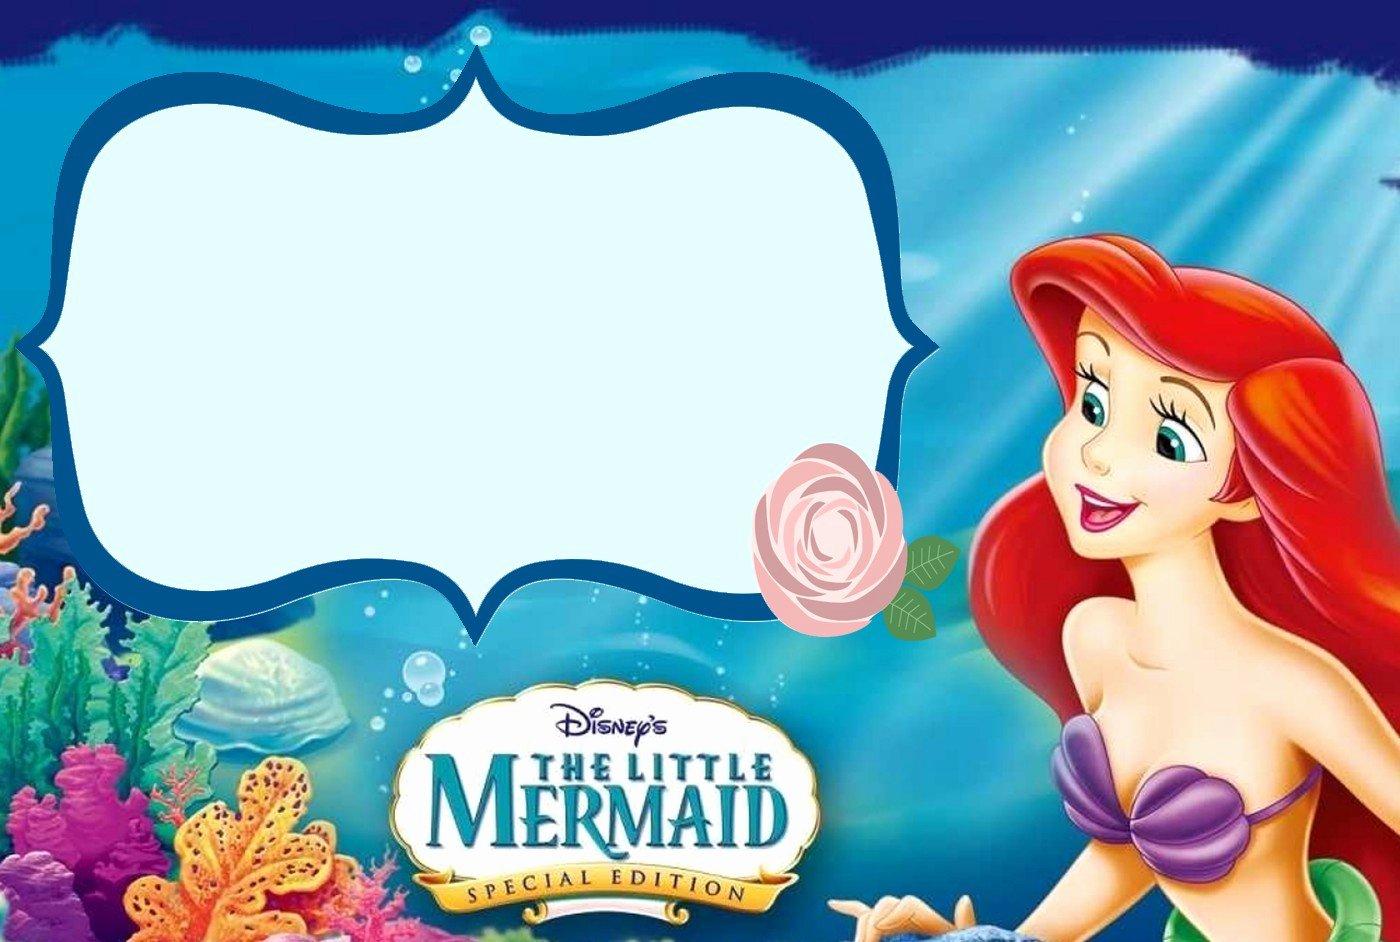 Mermaid Birthday Invitation Templates New Little Mermaid Free Printable Invitation Templates